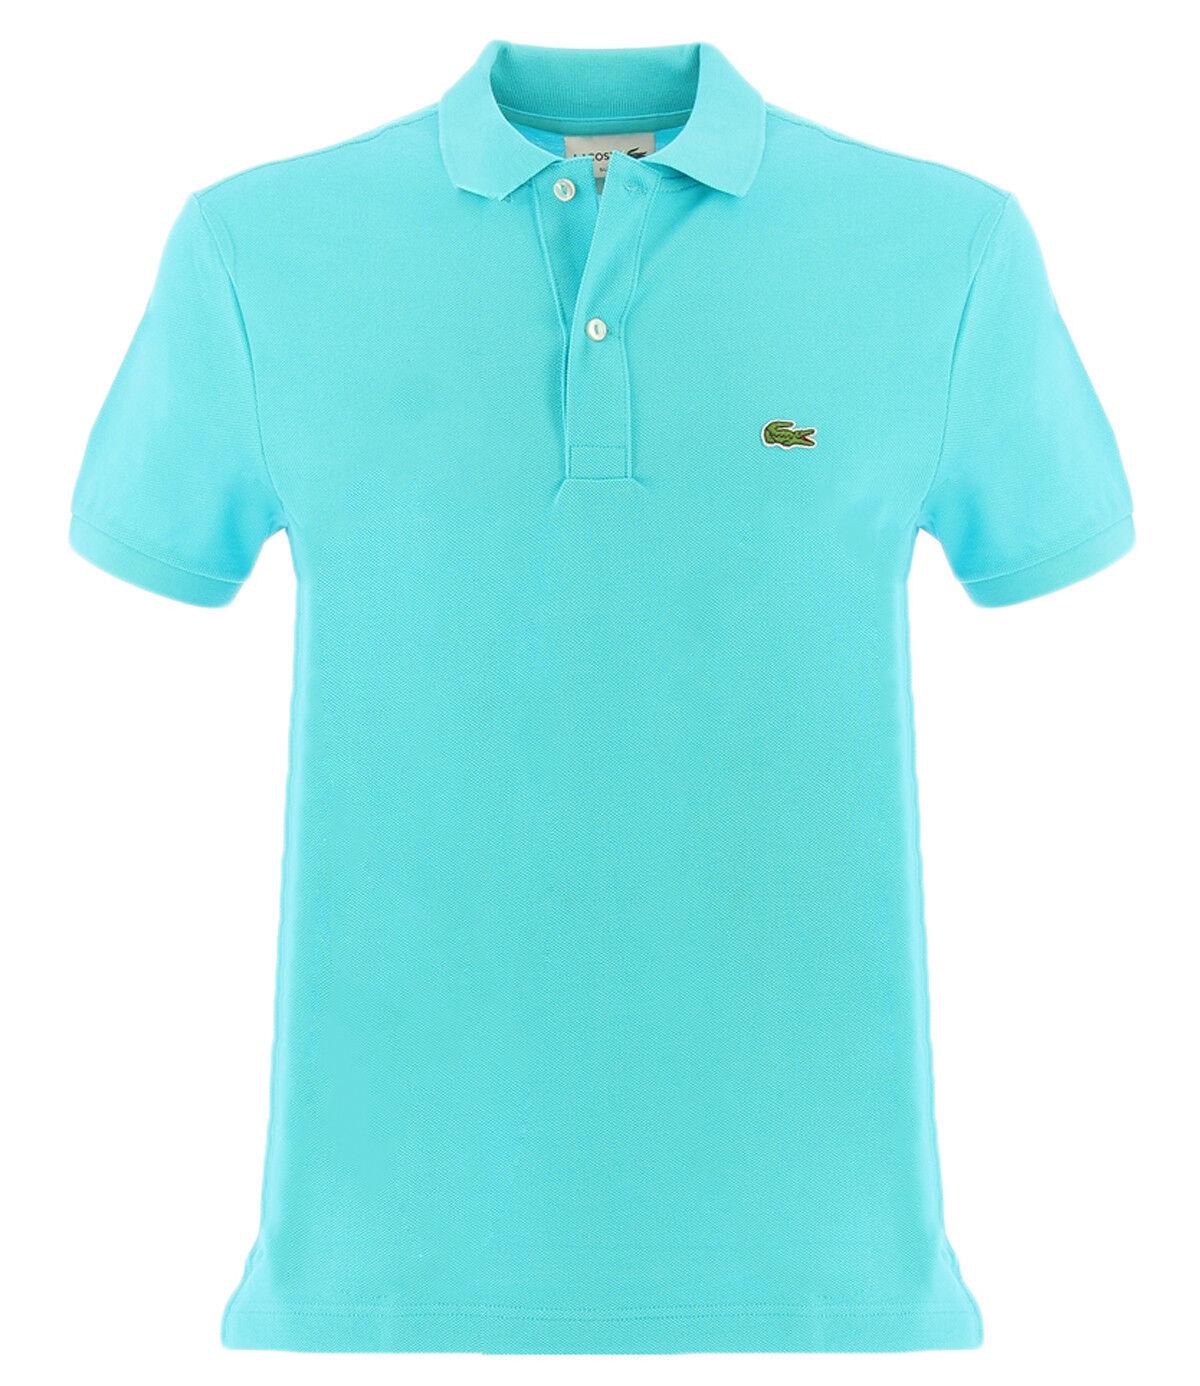 Lacoste Slim Fit Poloshirt, hellblue für Männer Lacoste 4012 SLIM FITXA4